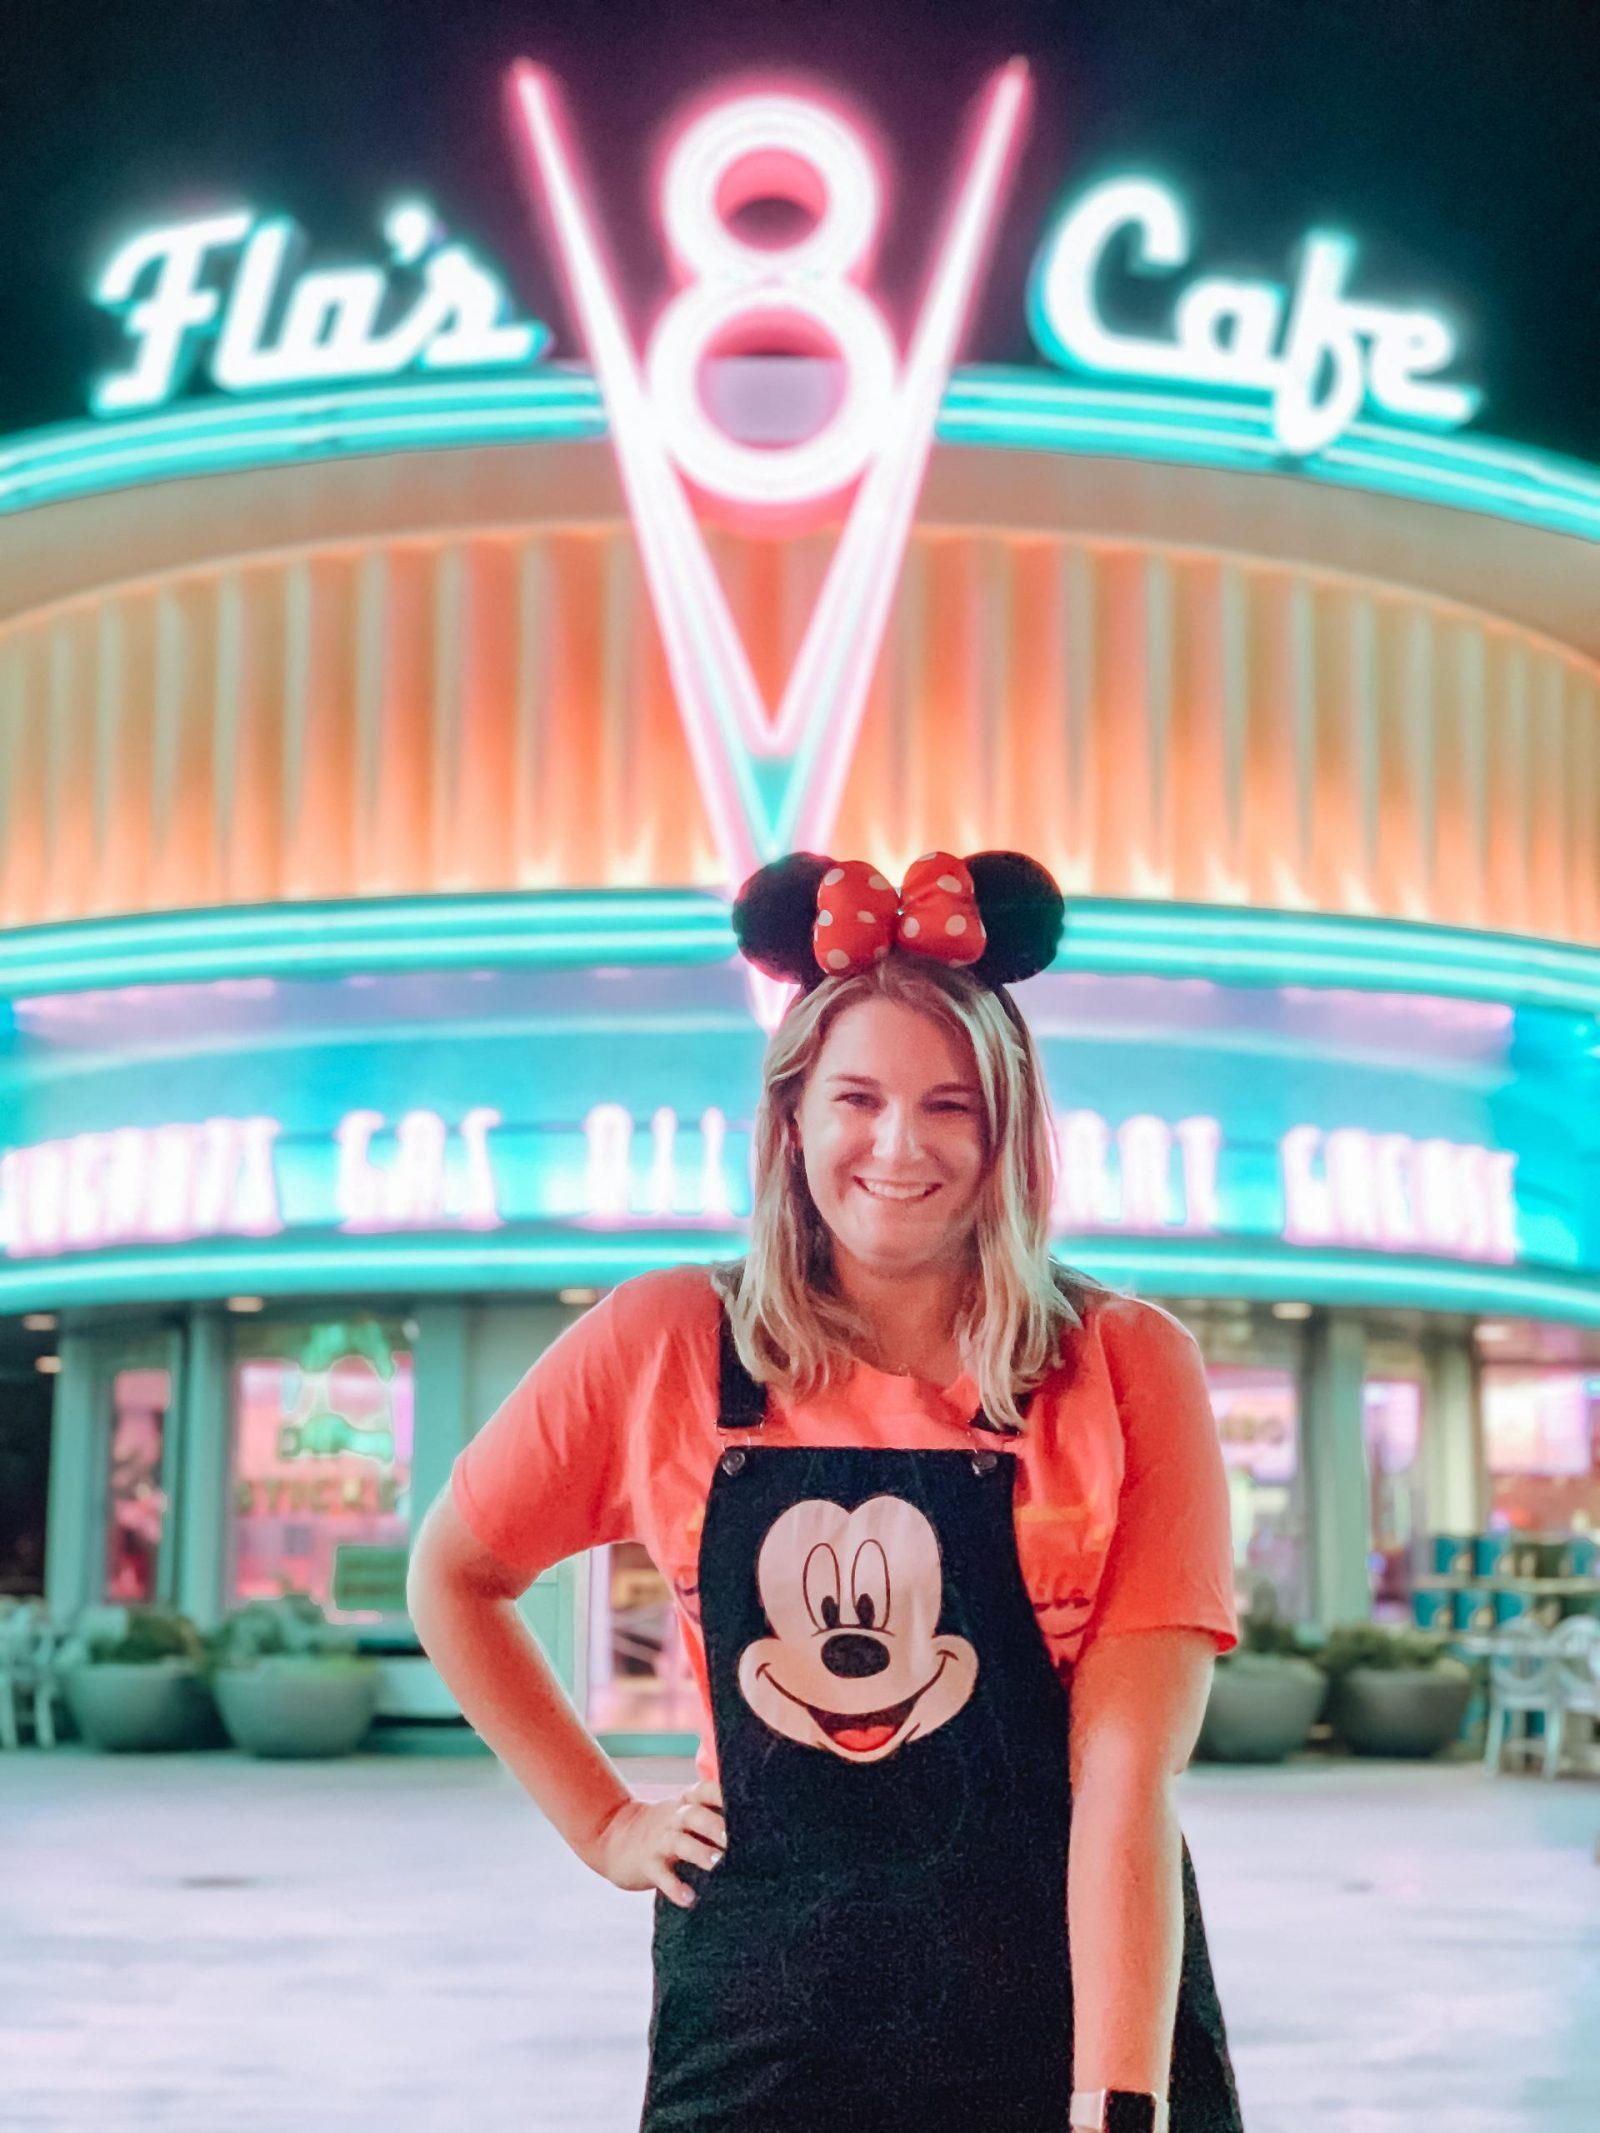 Flo's Cafe in Carsland, Disneyland California.